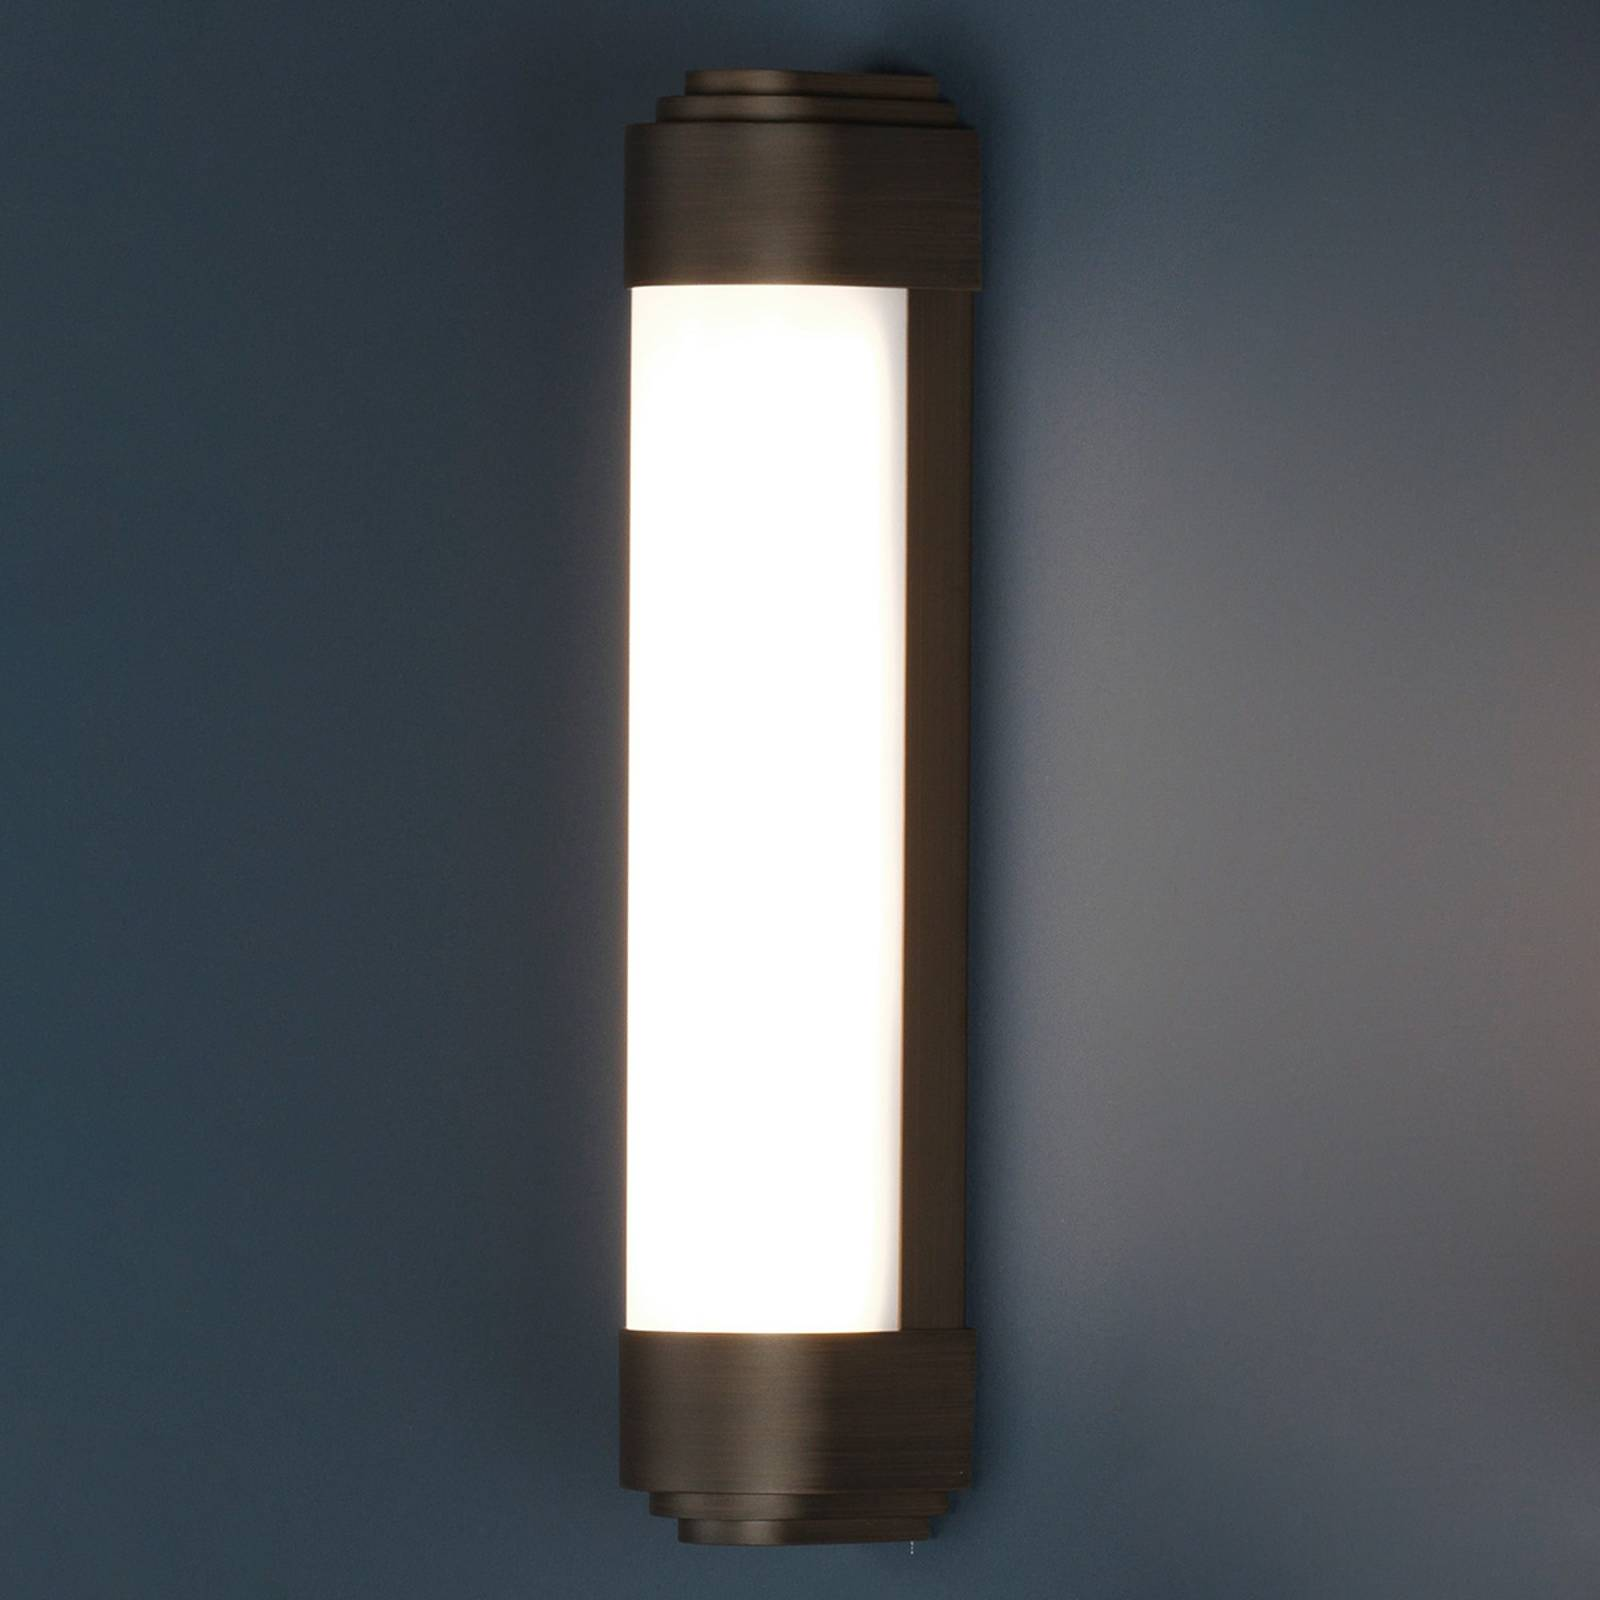 Astro Belgravia LED-Wandleuchte, 40 cm